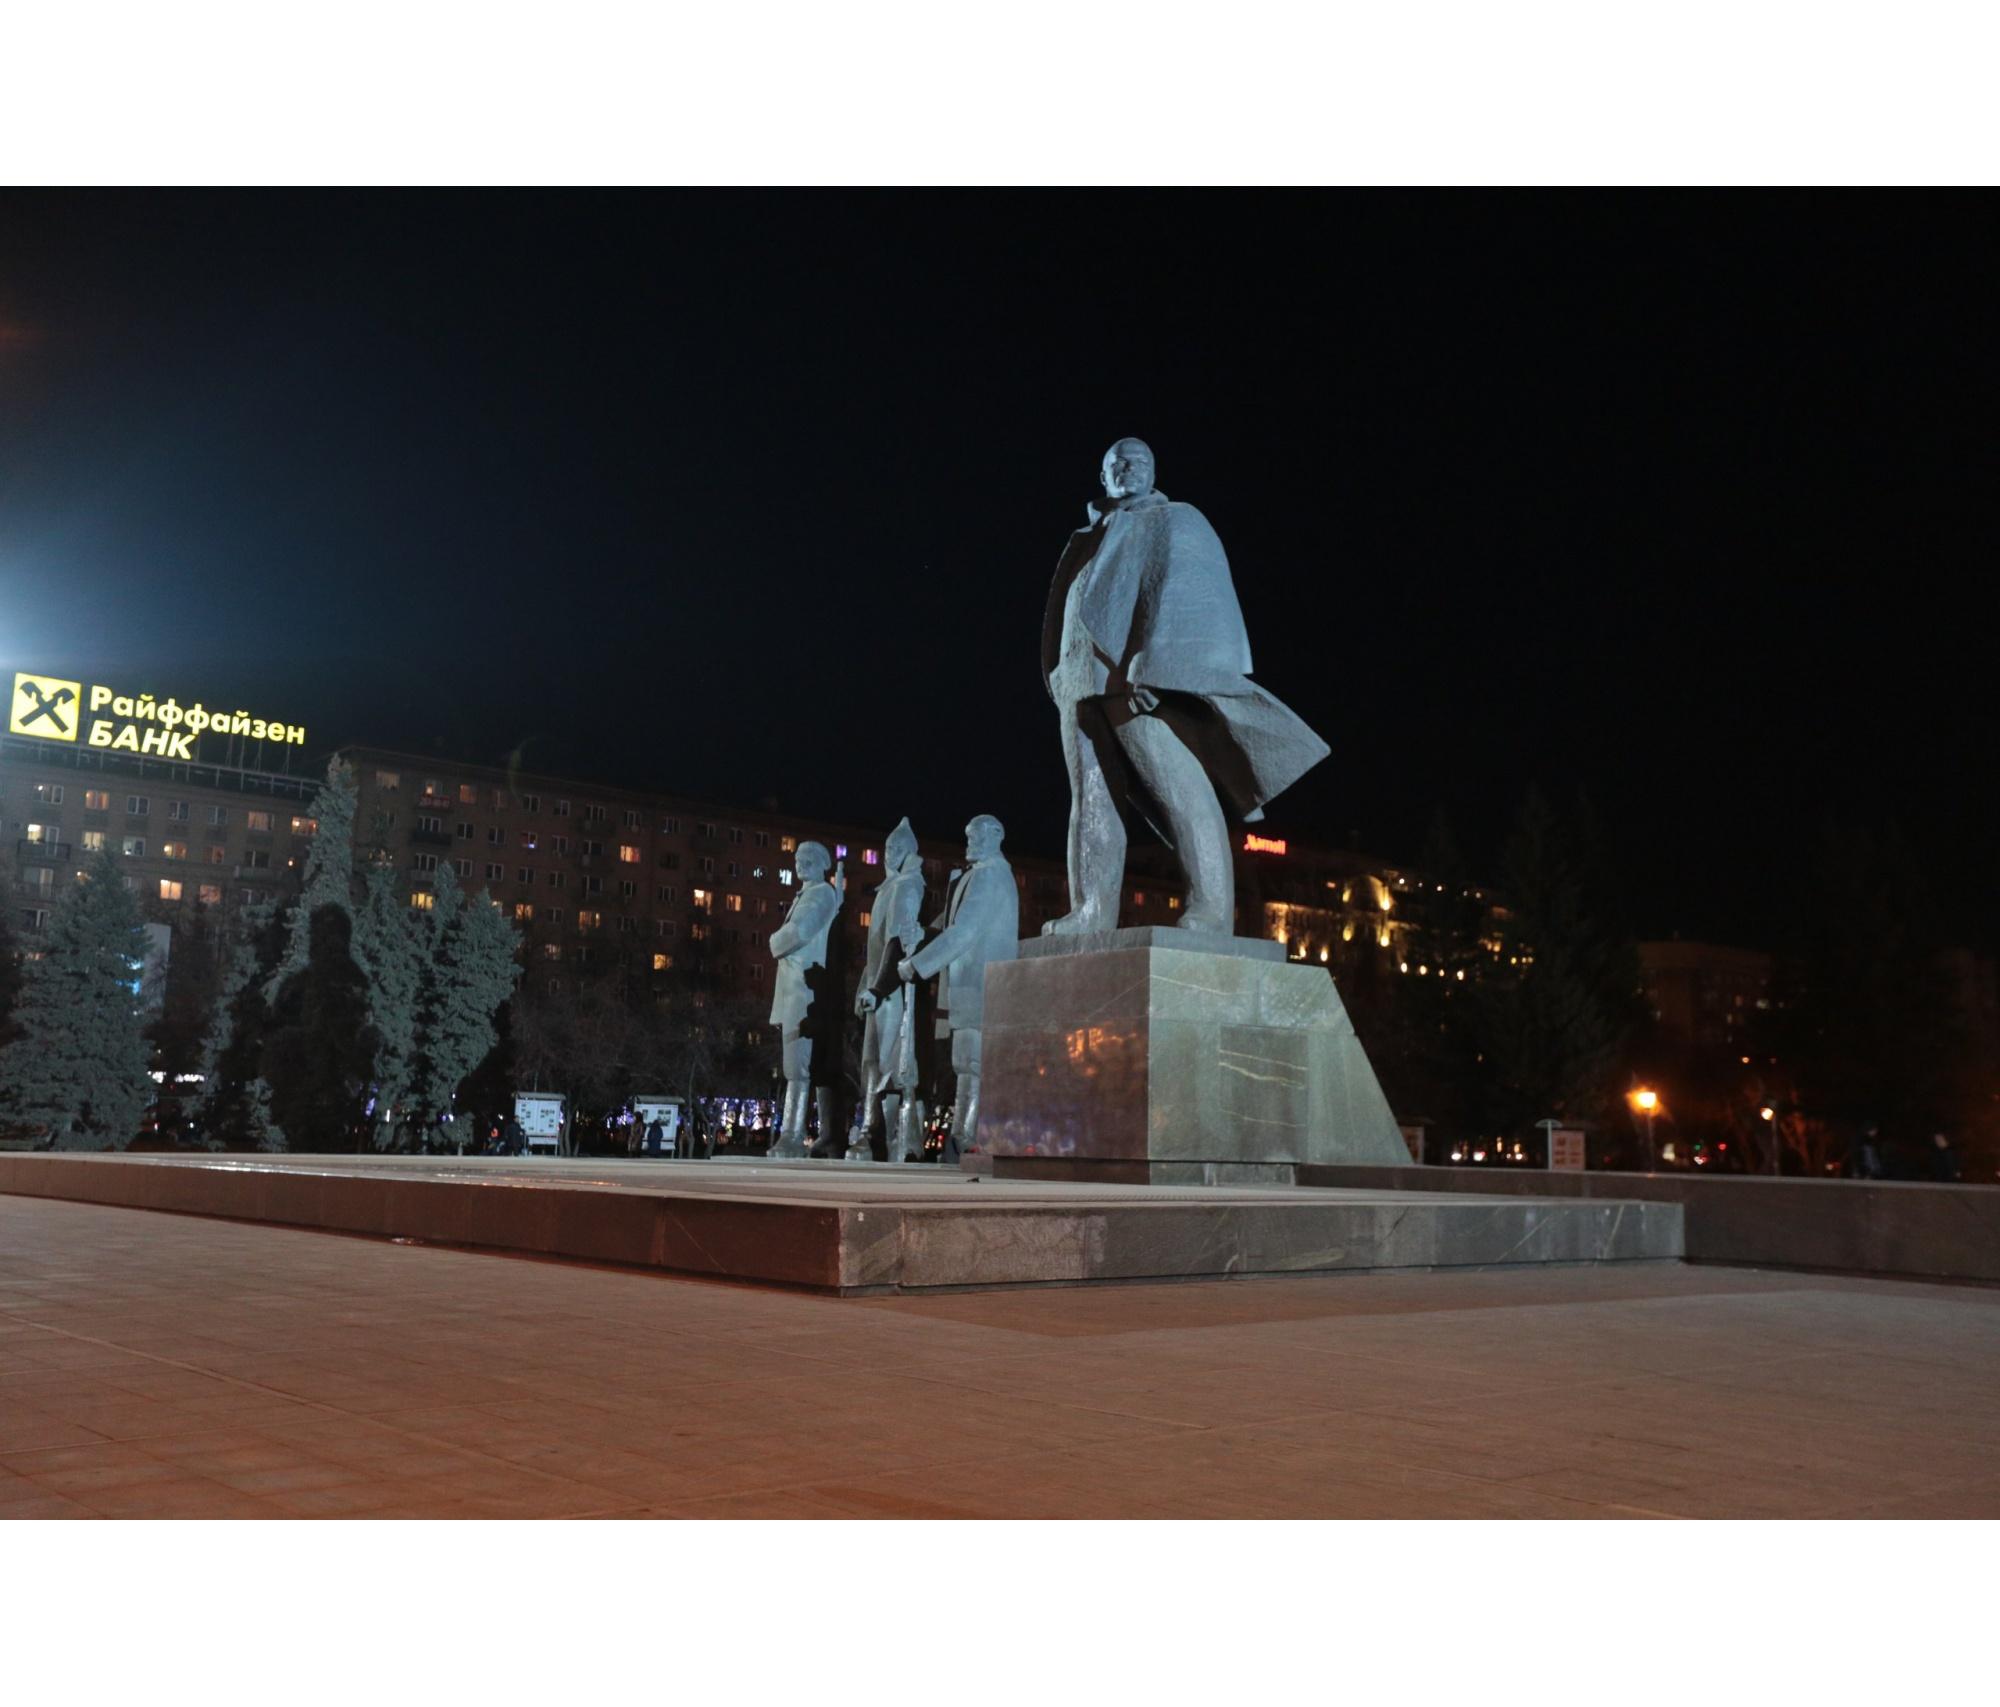 Светят на Ленина прожекторы с двух мачт